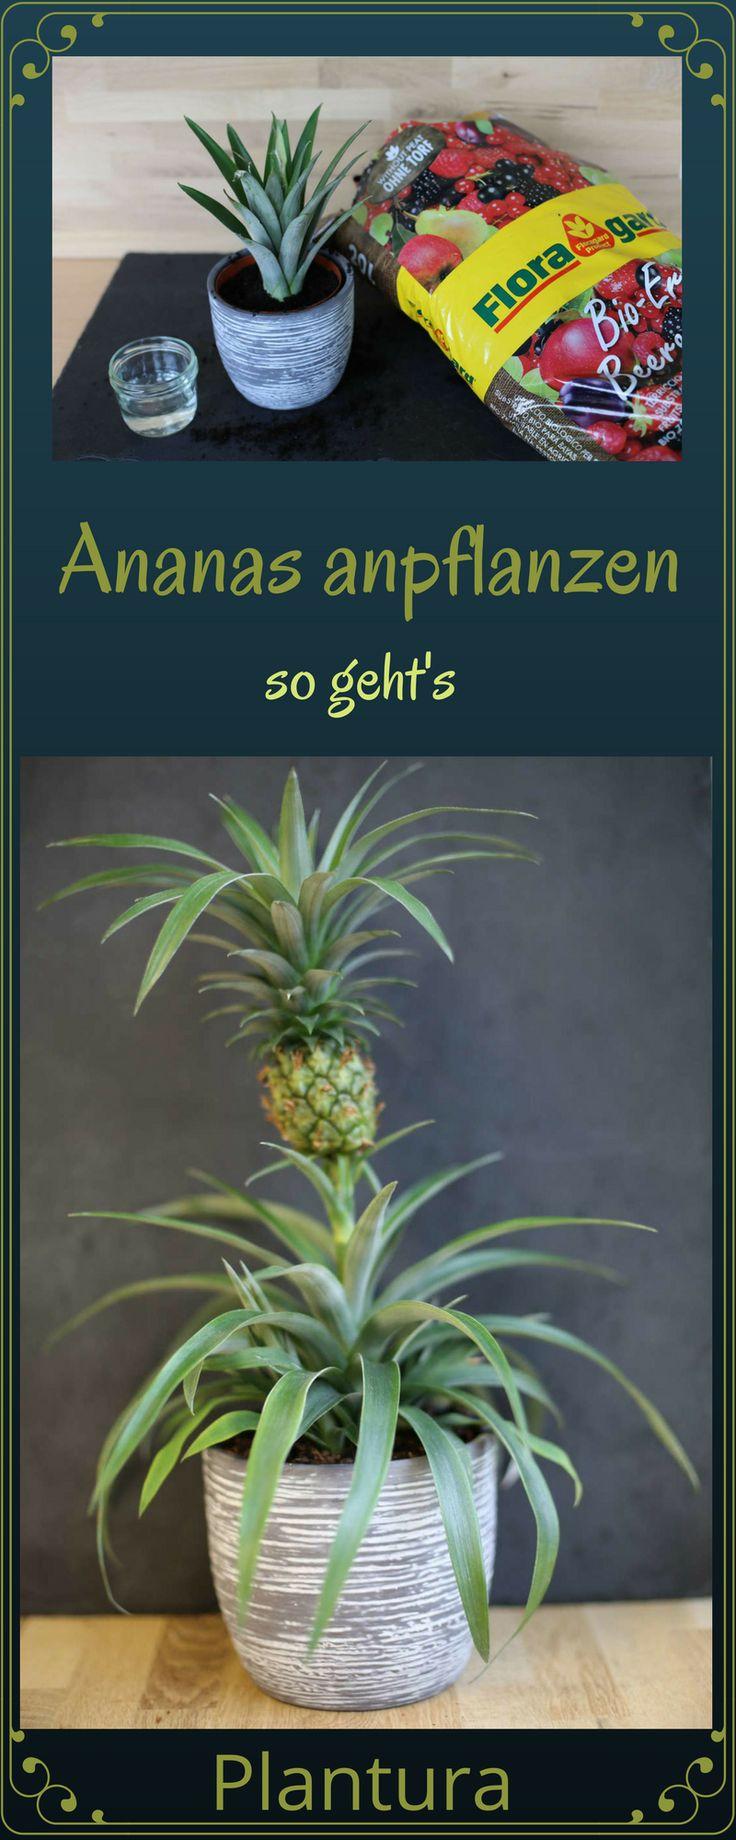 Ananas anpflanzen: Vermehrung & Anbau (Anleitung